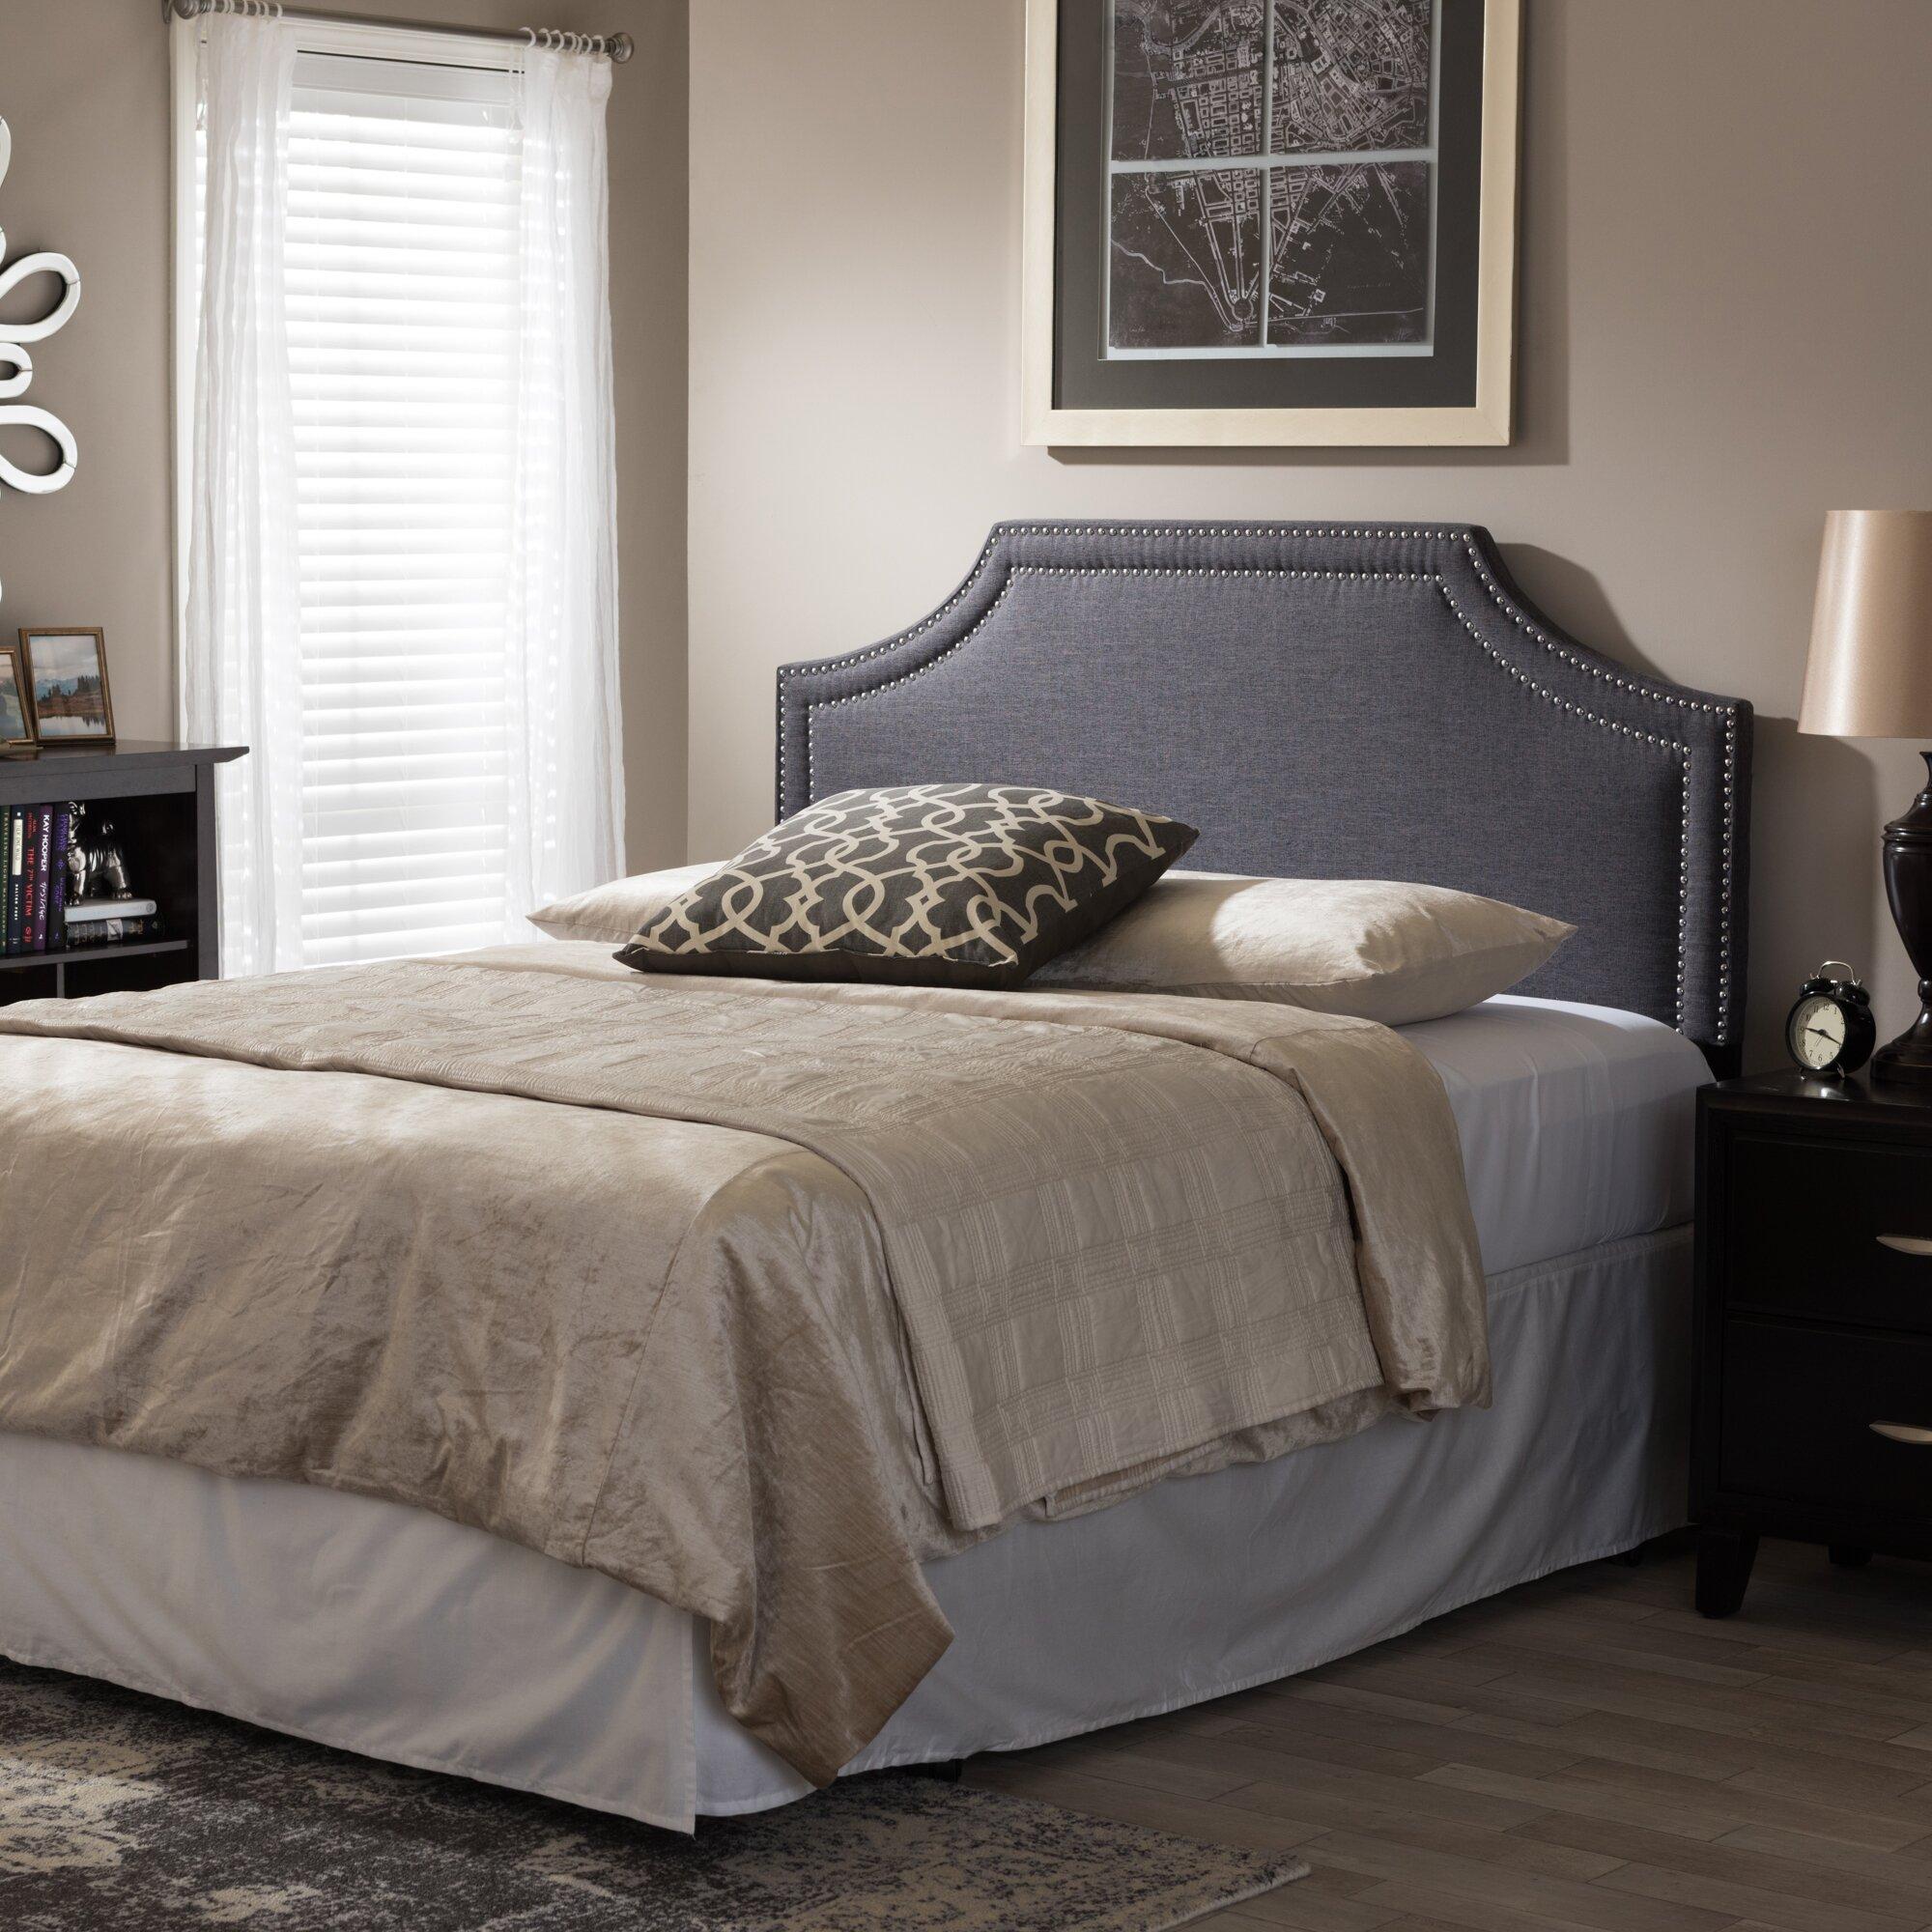 Wholesale Interiors Baxton Studio Ciro Upholstered